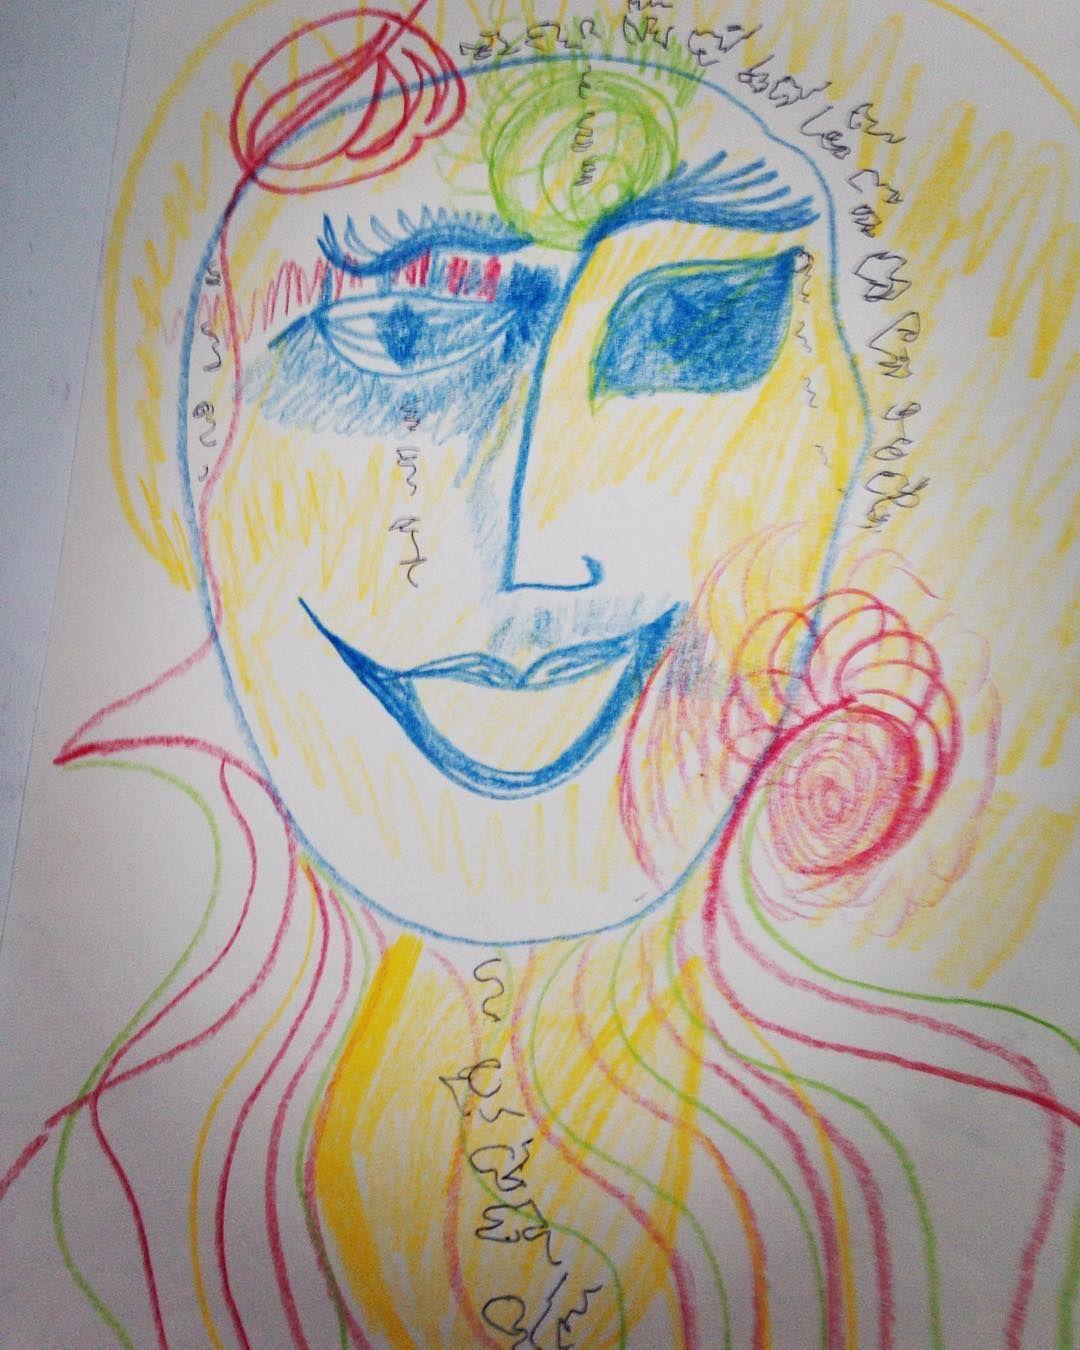 Psychic/aura/energy reading drawing#beautiful #magnificent #magazine #mexico #energy #america #aura #art #amor #argentina #artist #artmagazine #psychicart #psychicartist #healing #holistic #healersydney #holistichealth #publishers #publishersclearinghouse #womensfashion #tarot #therapy #tarotcards #pastlives by designsbyrosalina